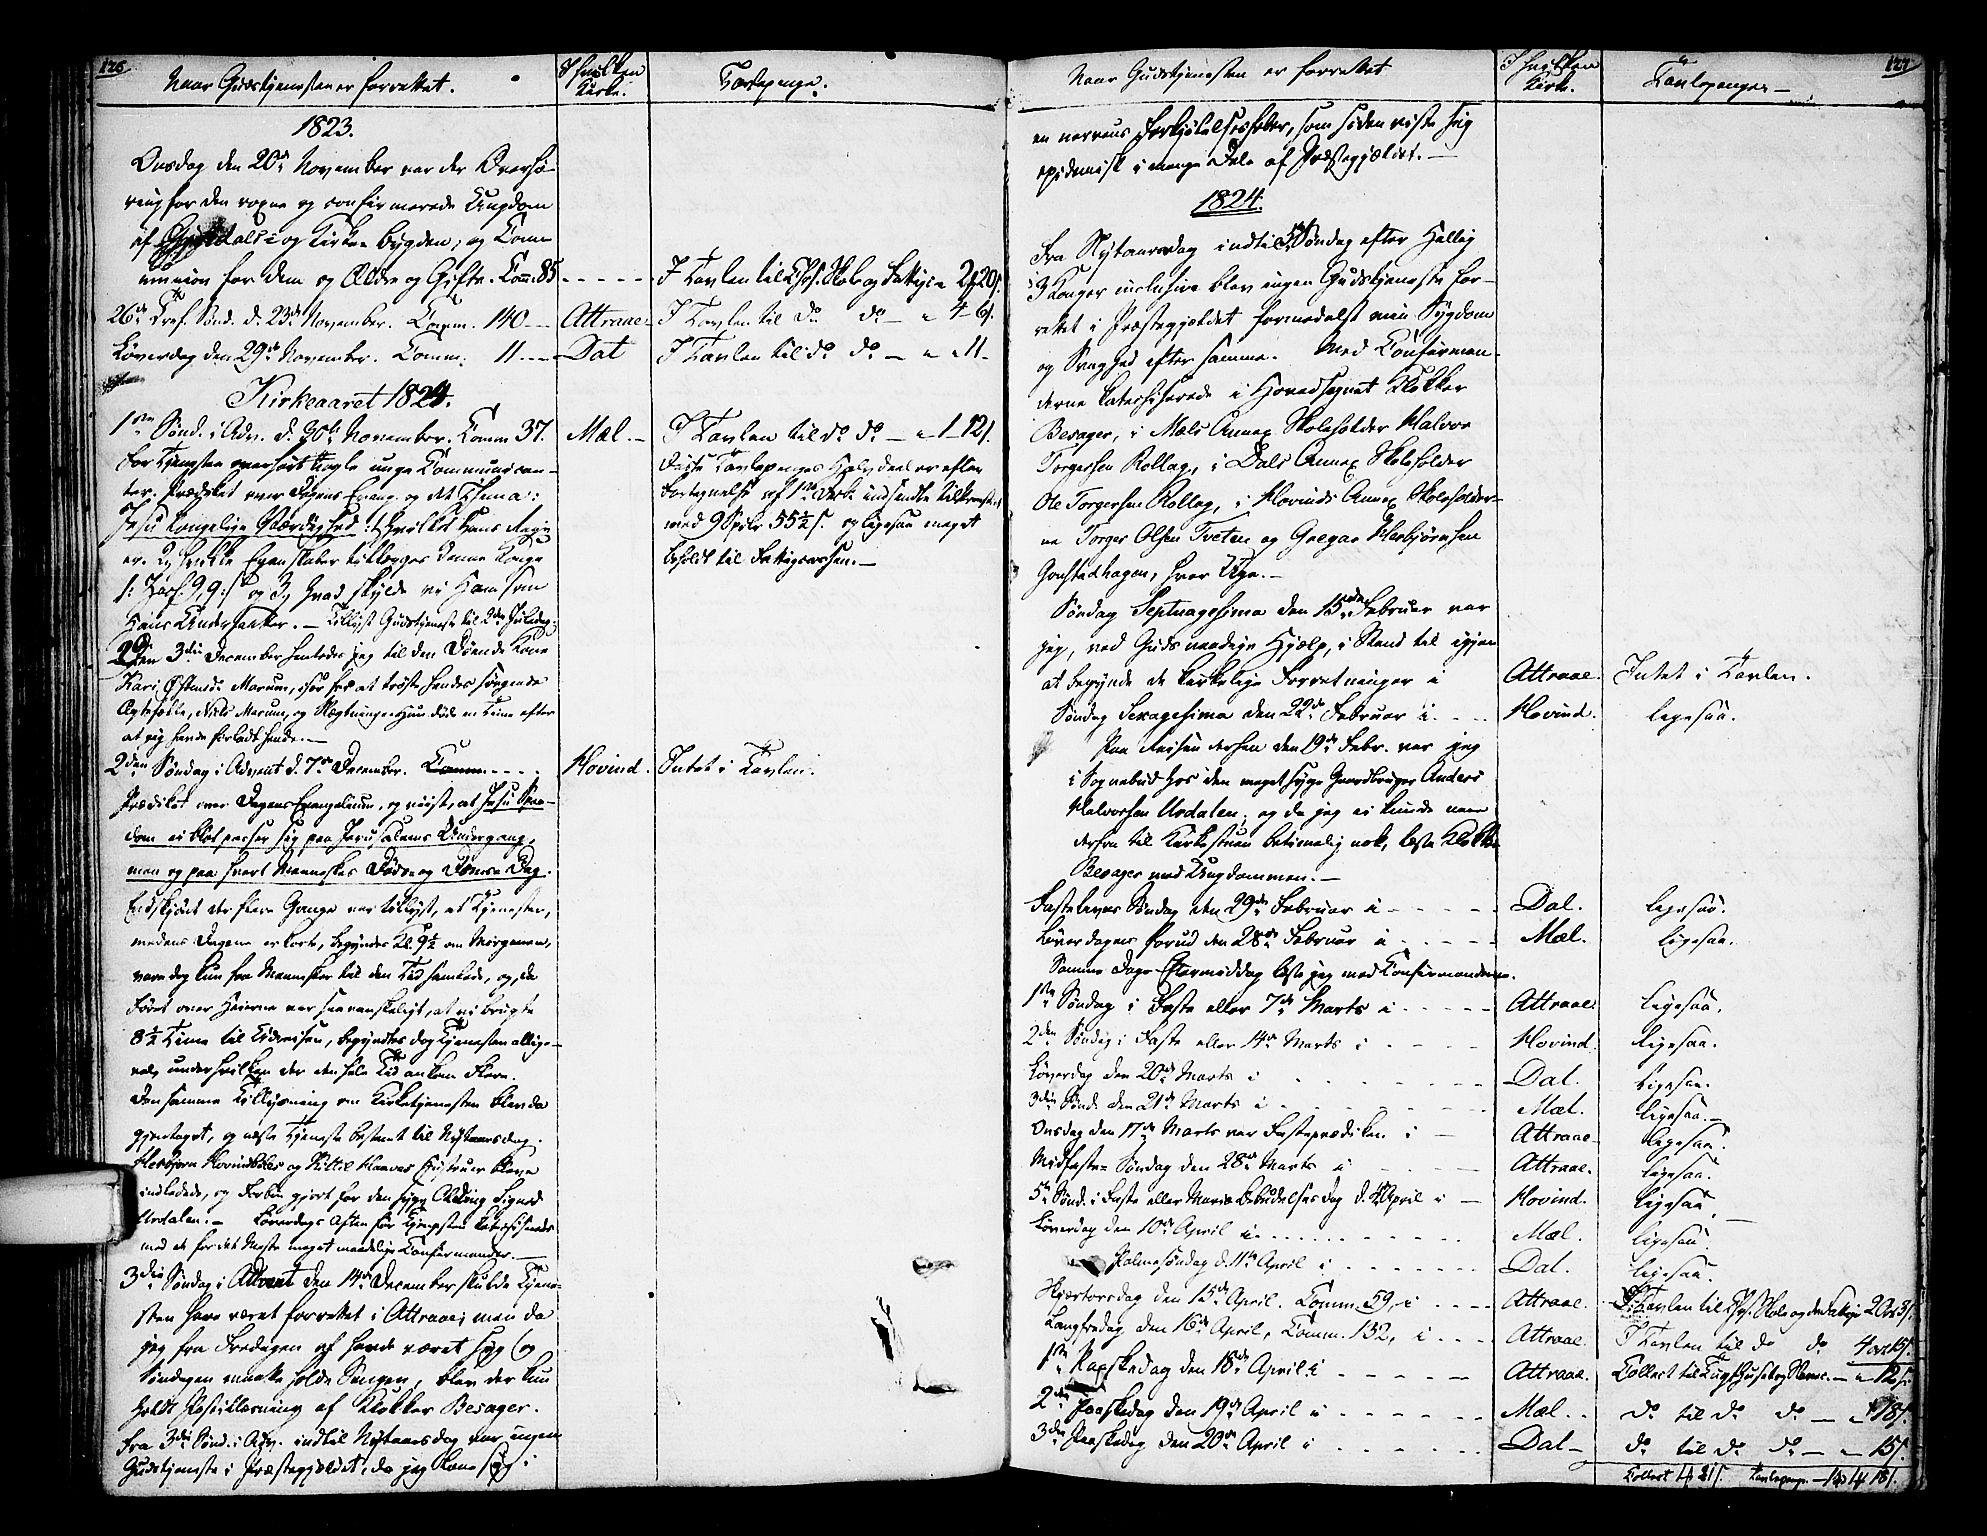 SAKO, Tinn kirkebøker, F/Fa/L0003: Ministerialbok nr. I 3, 1810-1814, s. 126-127